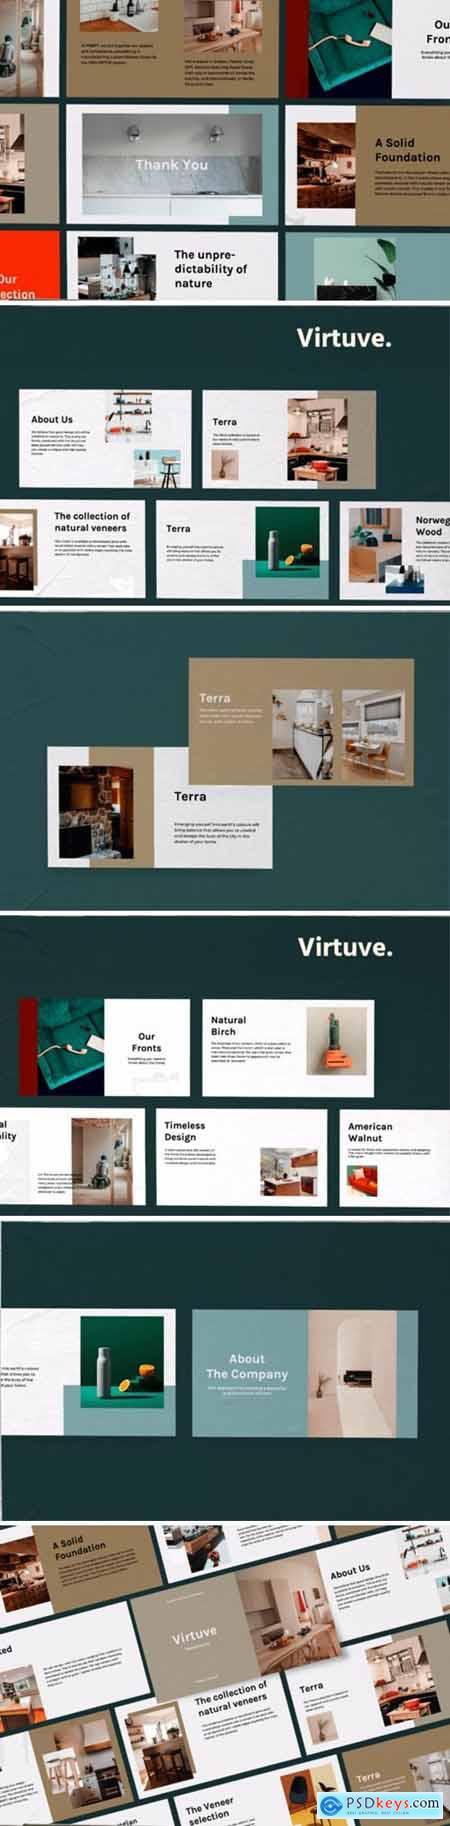 Virtuve - Powerpoint Template 3039489